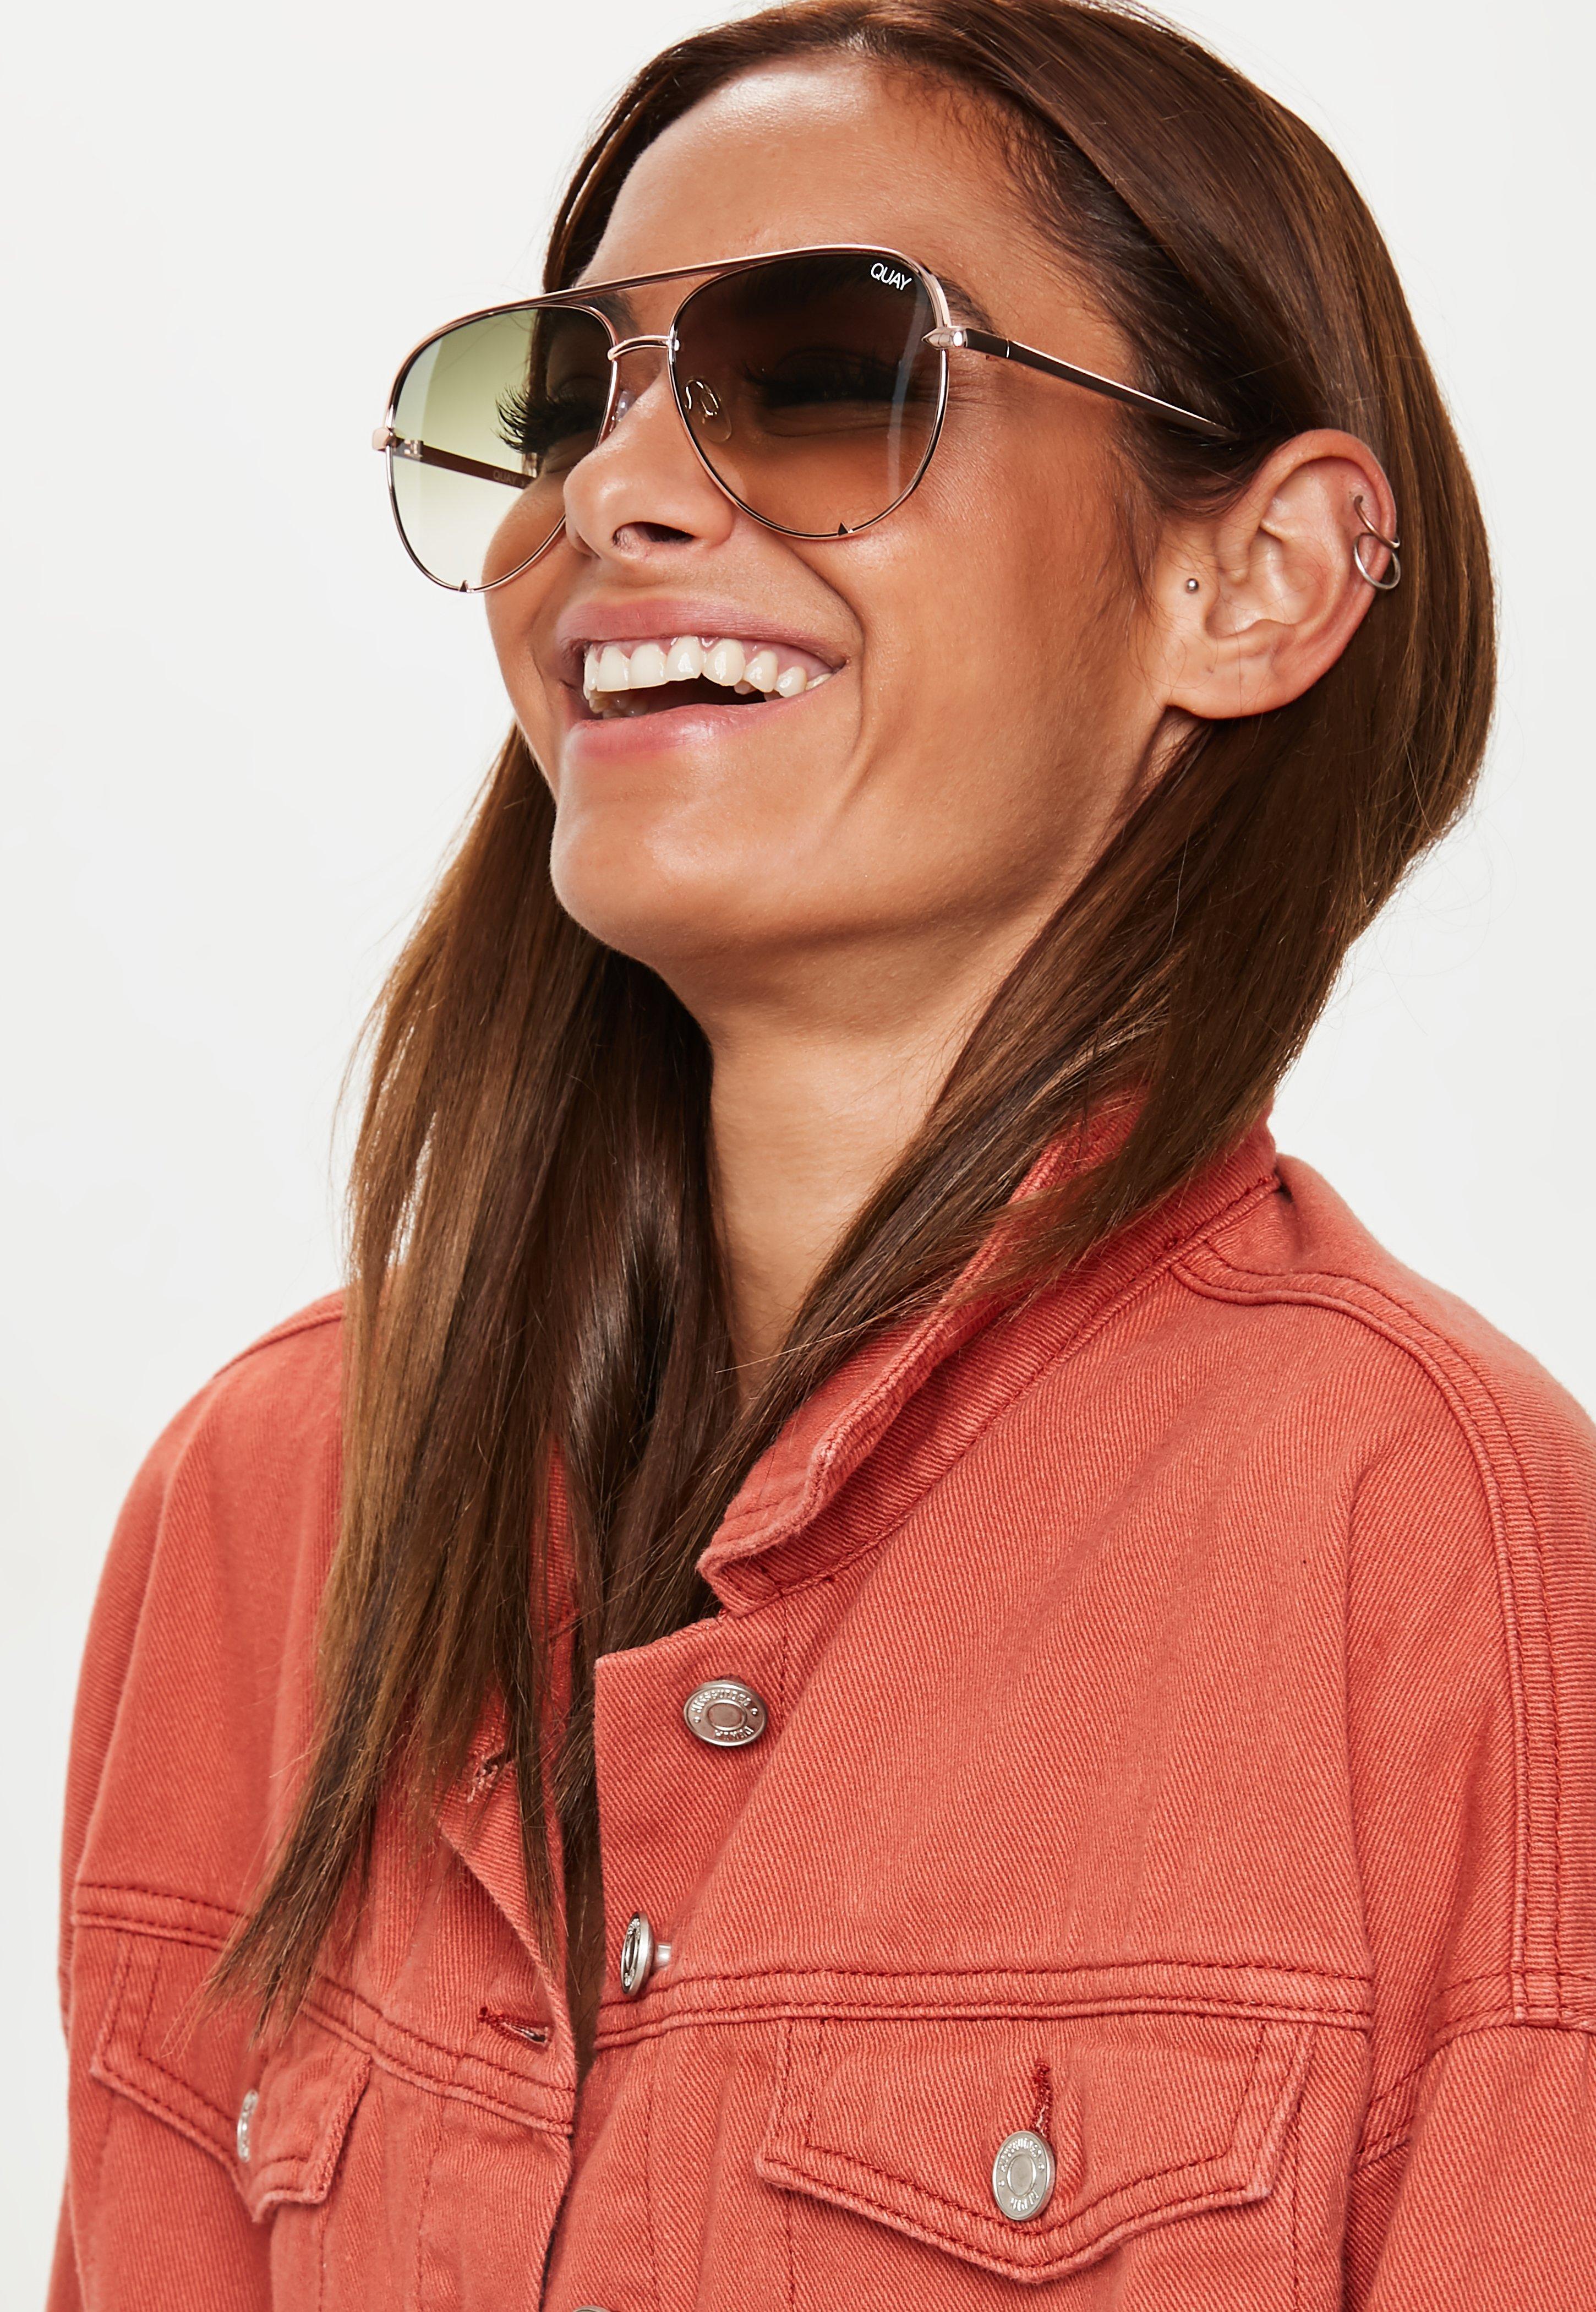 746648a51e57f Quay Australia Sunglasses UK - Missguided